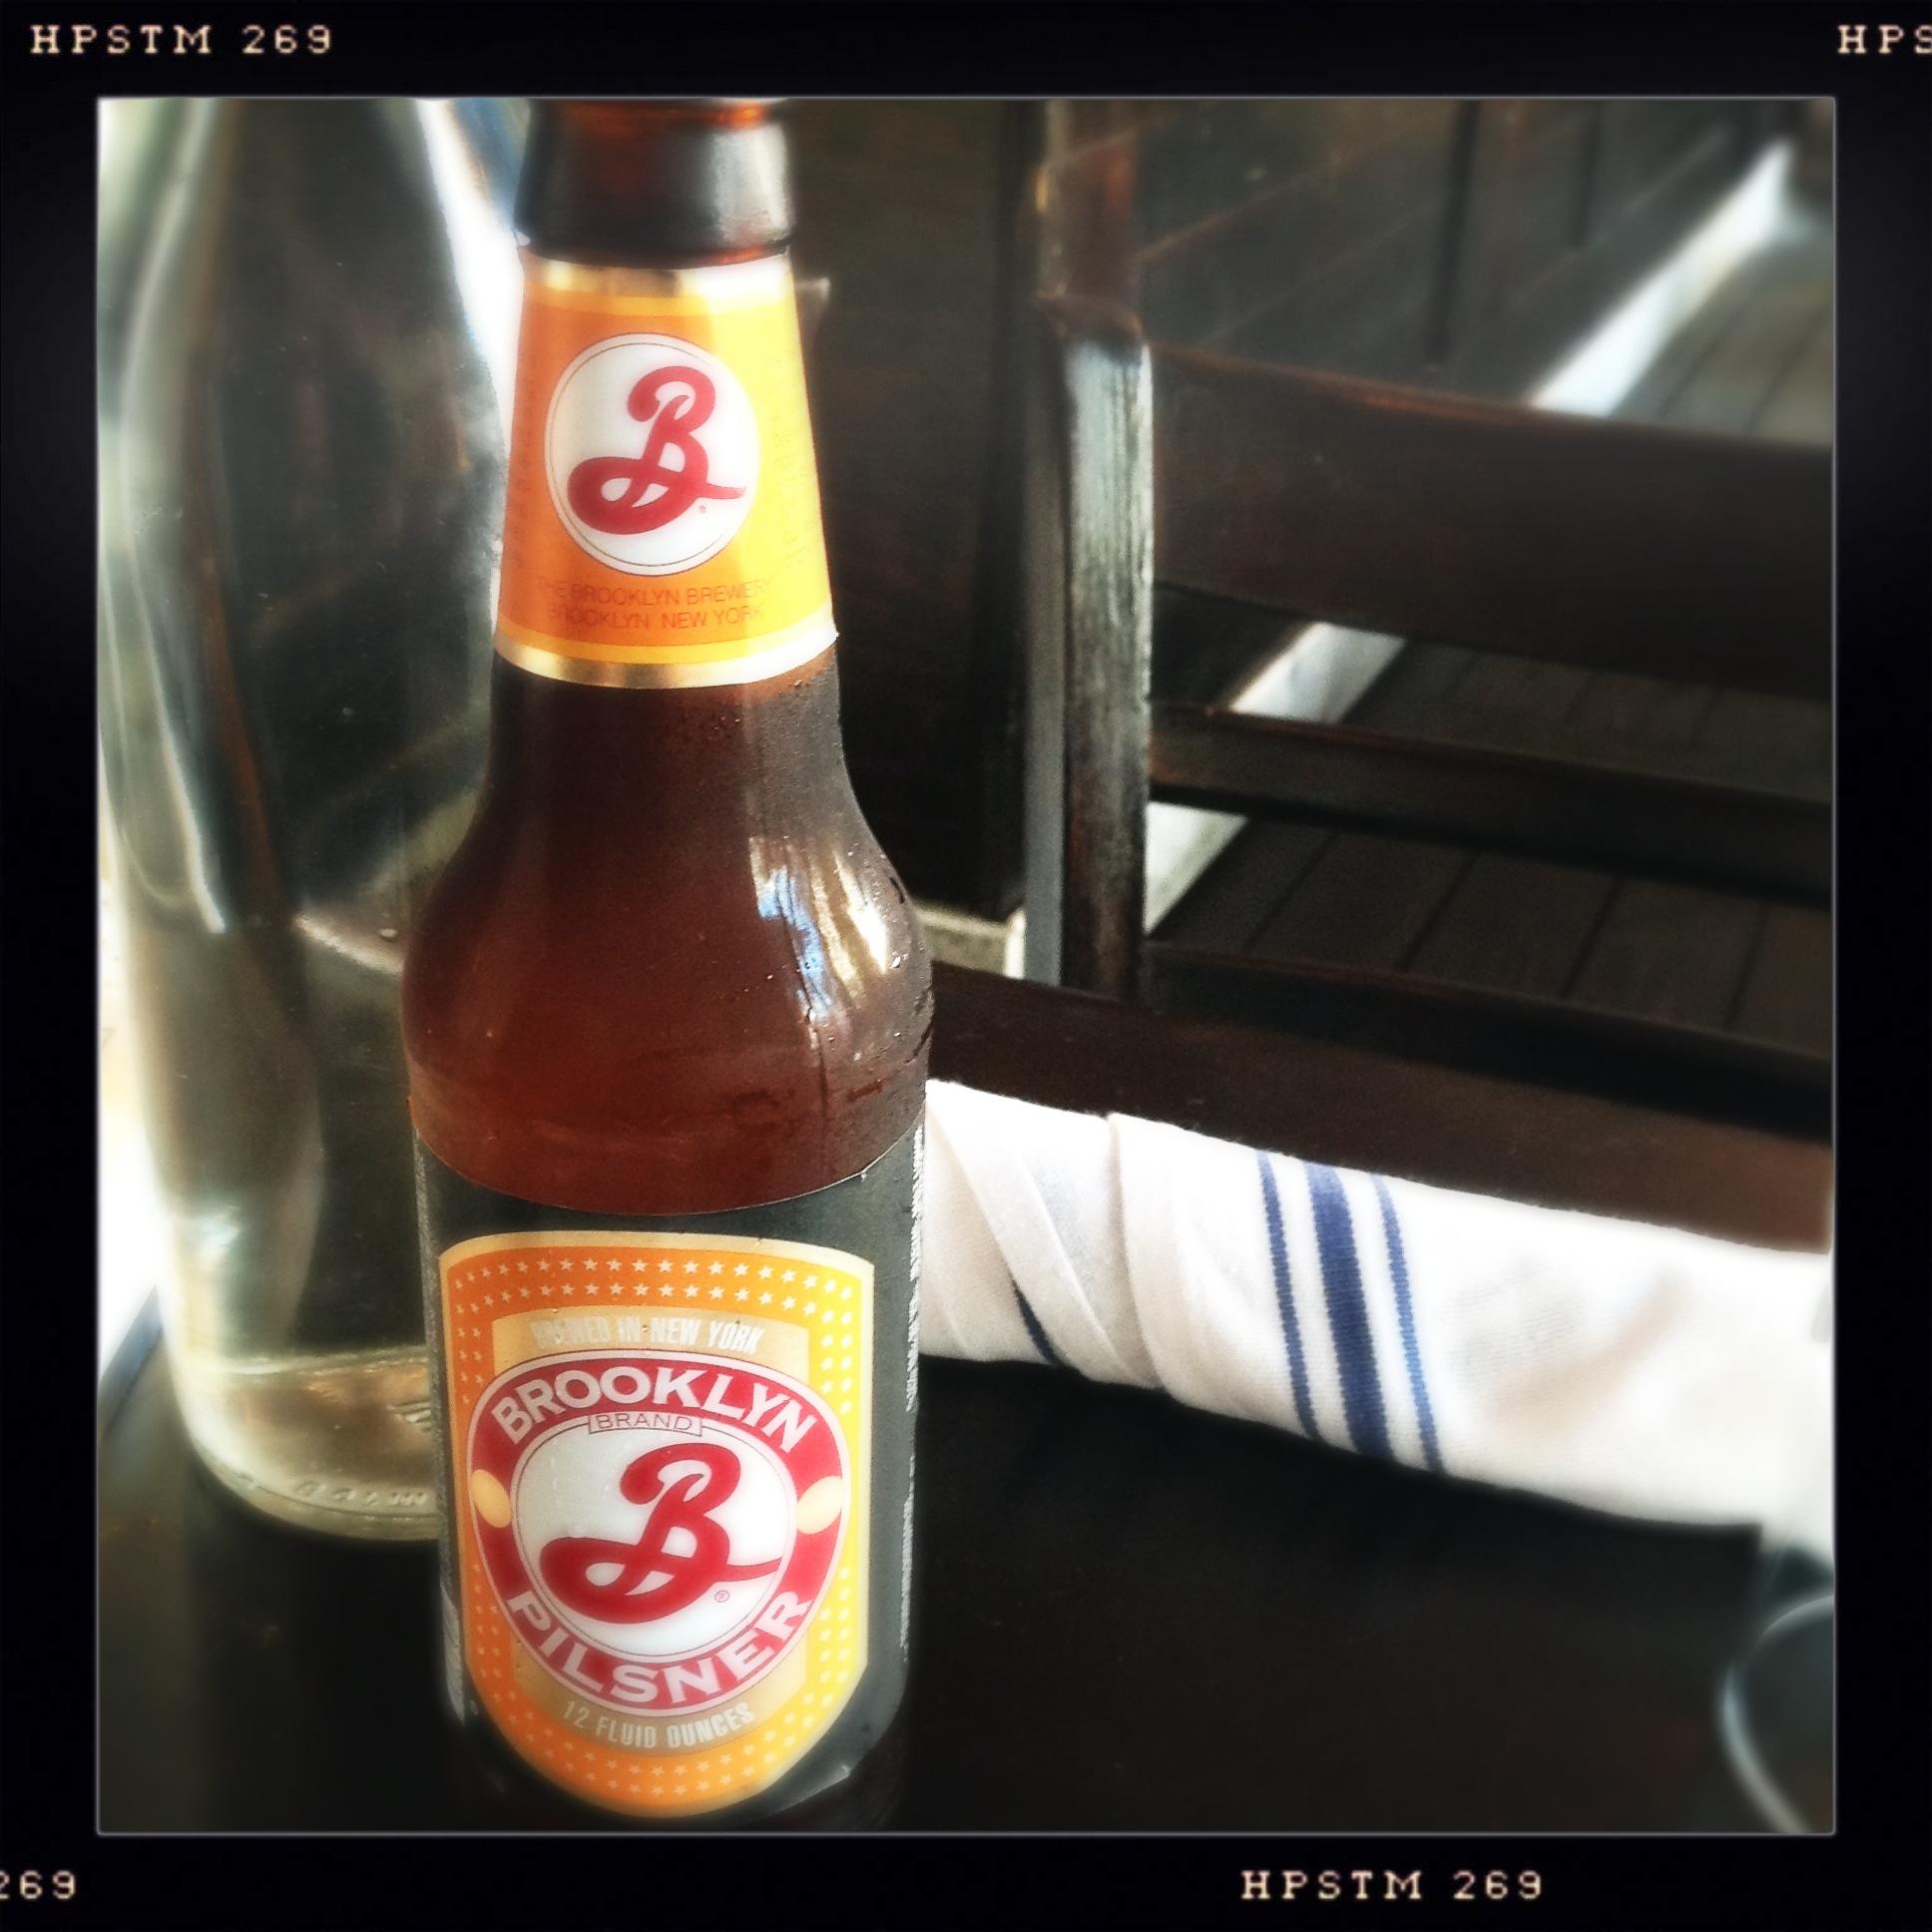 BROOKLYN FOOD & DRINK: THE STATION – TOKIDOKI (NOMAD)